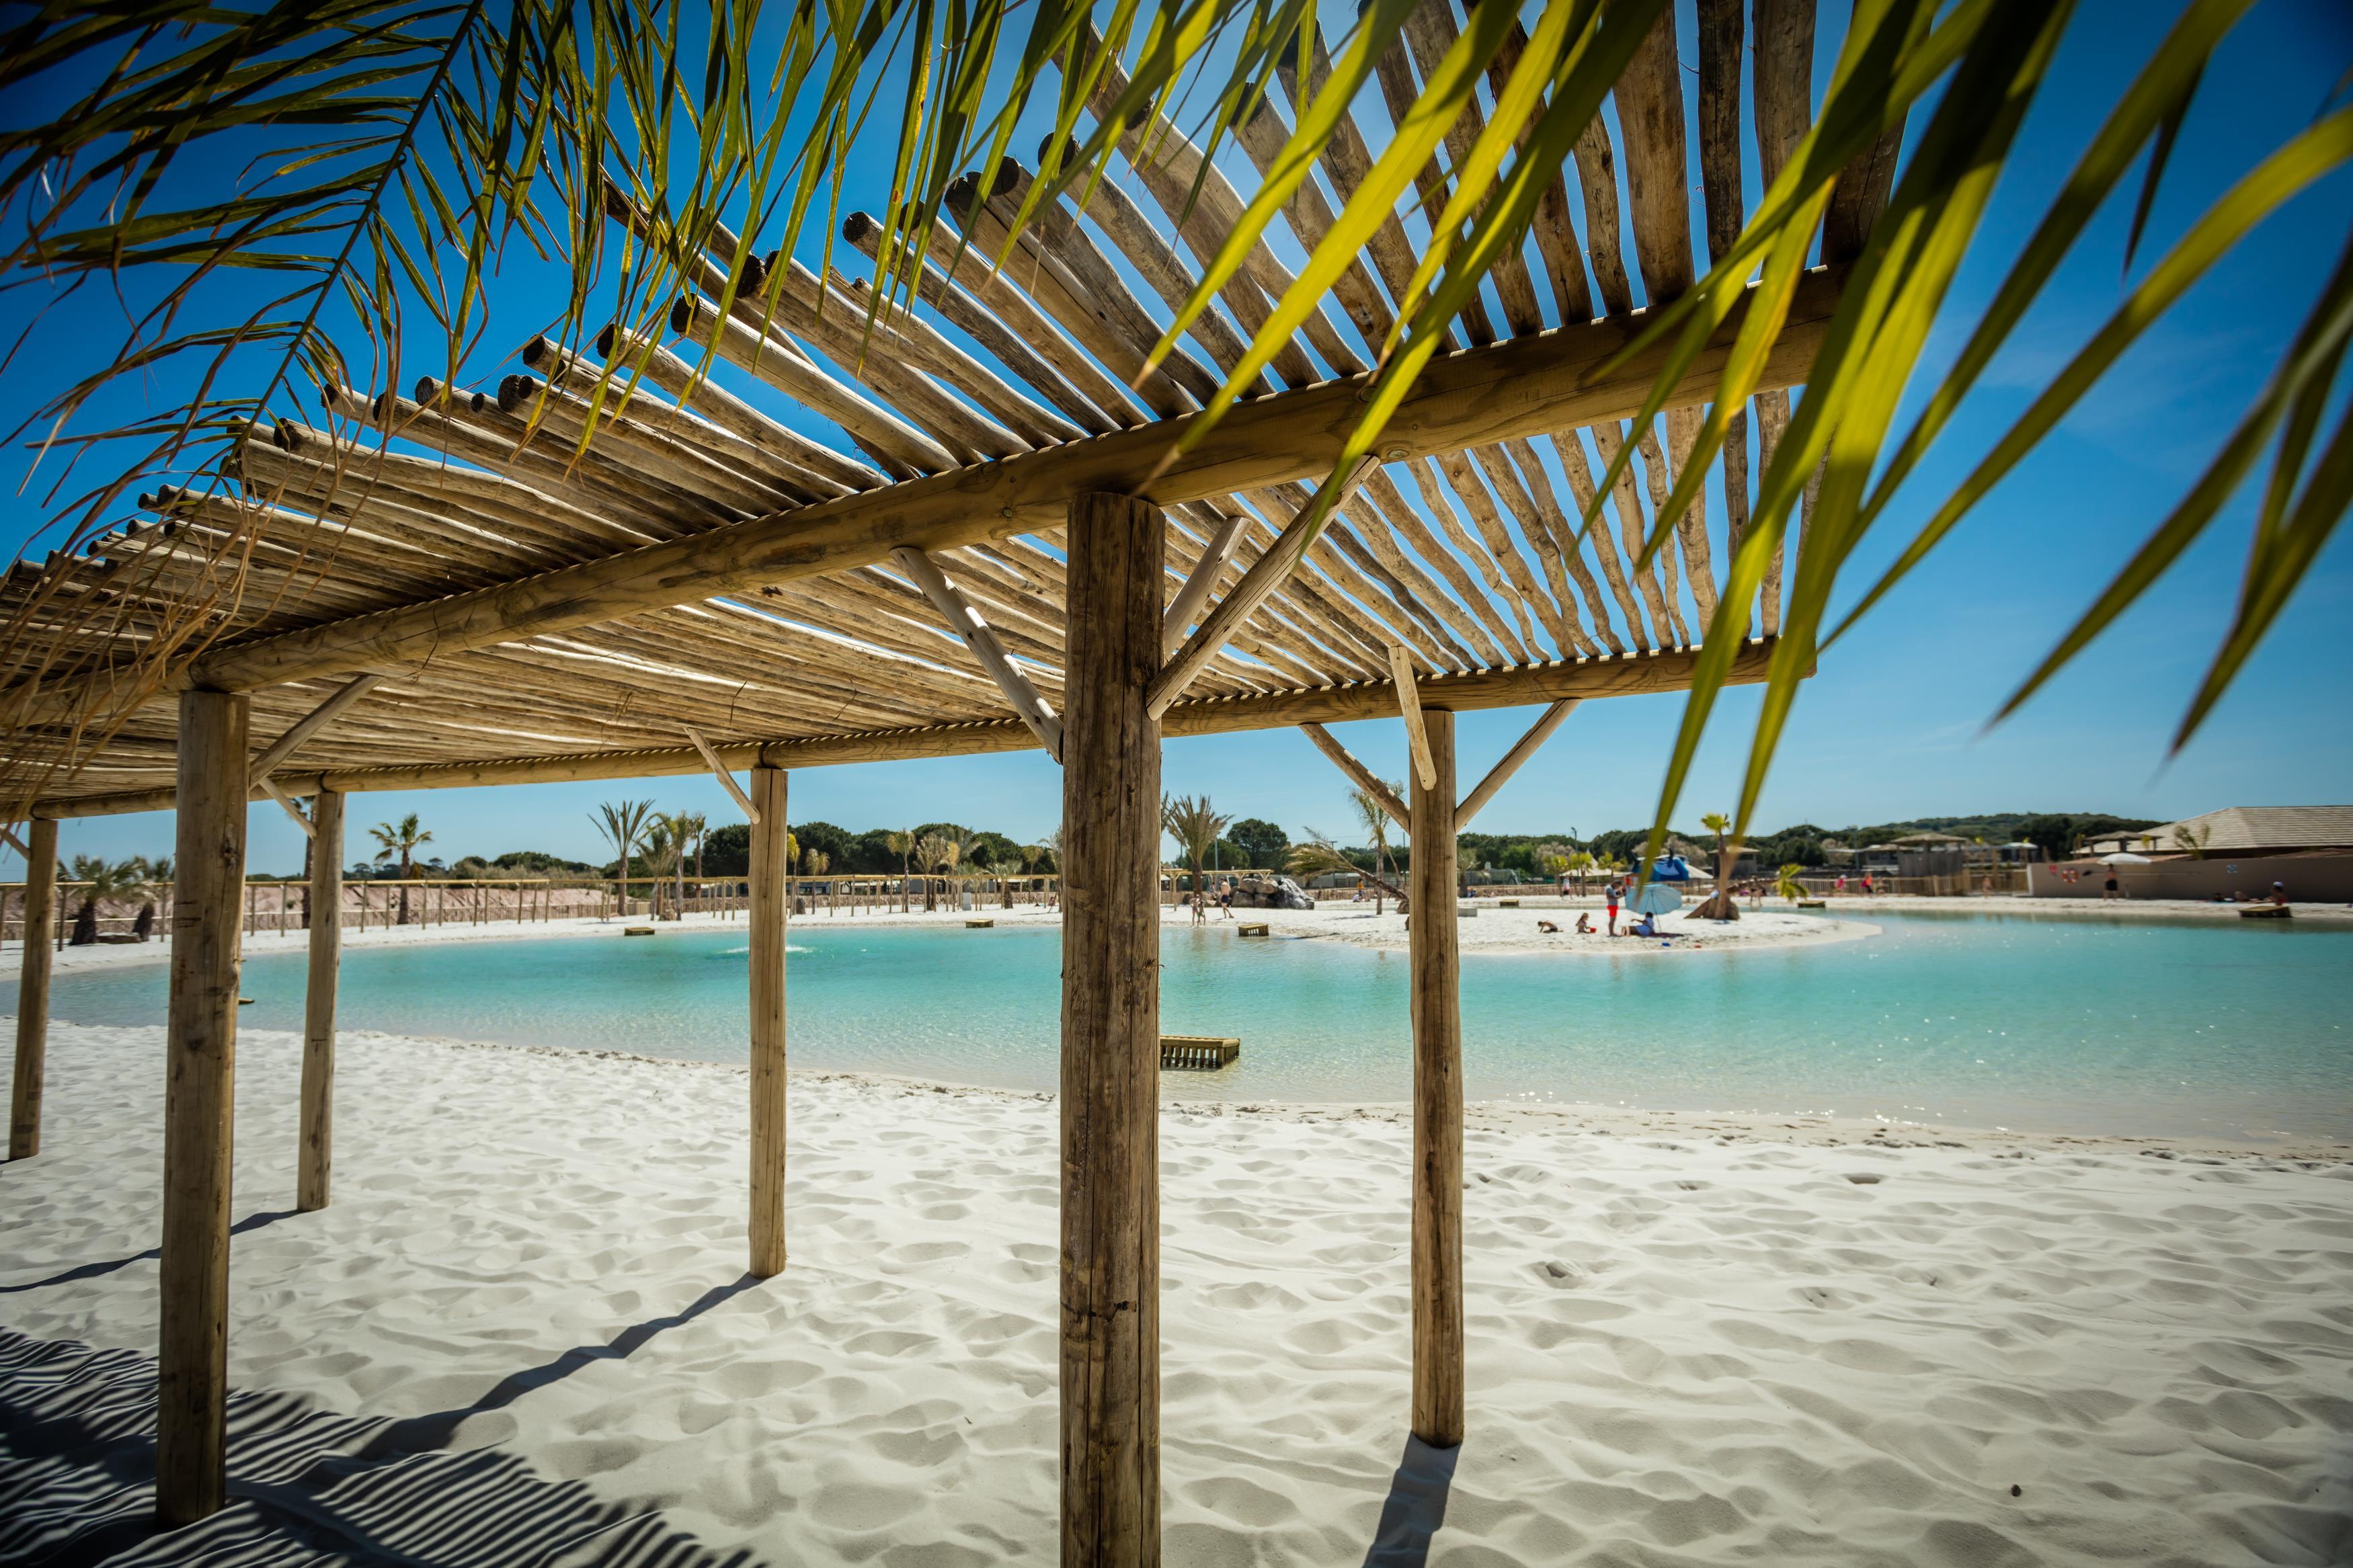 Lagoon Beach Canopy Parasol Sand Sea Recreation